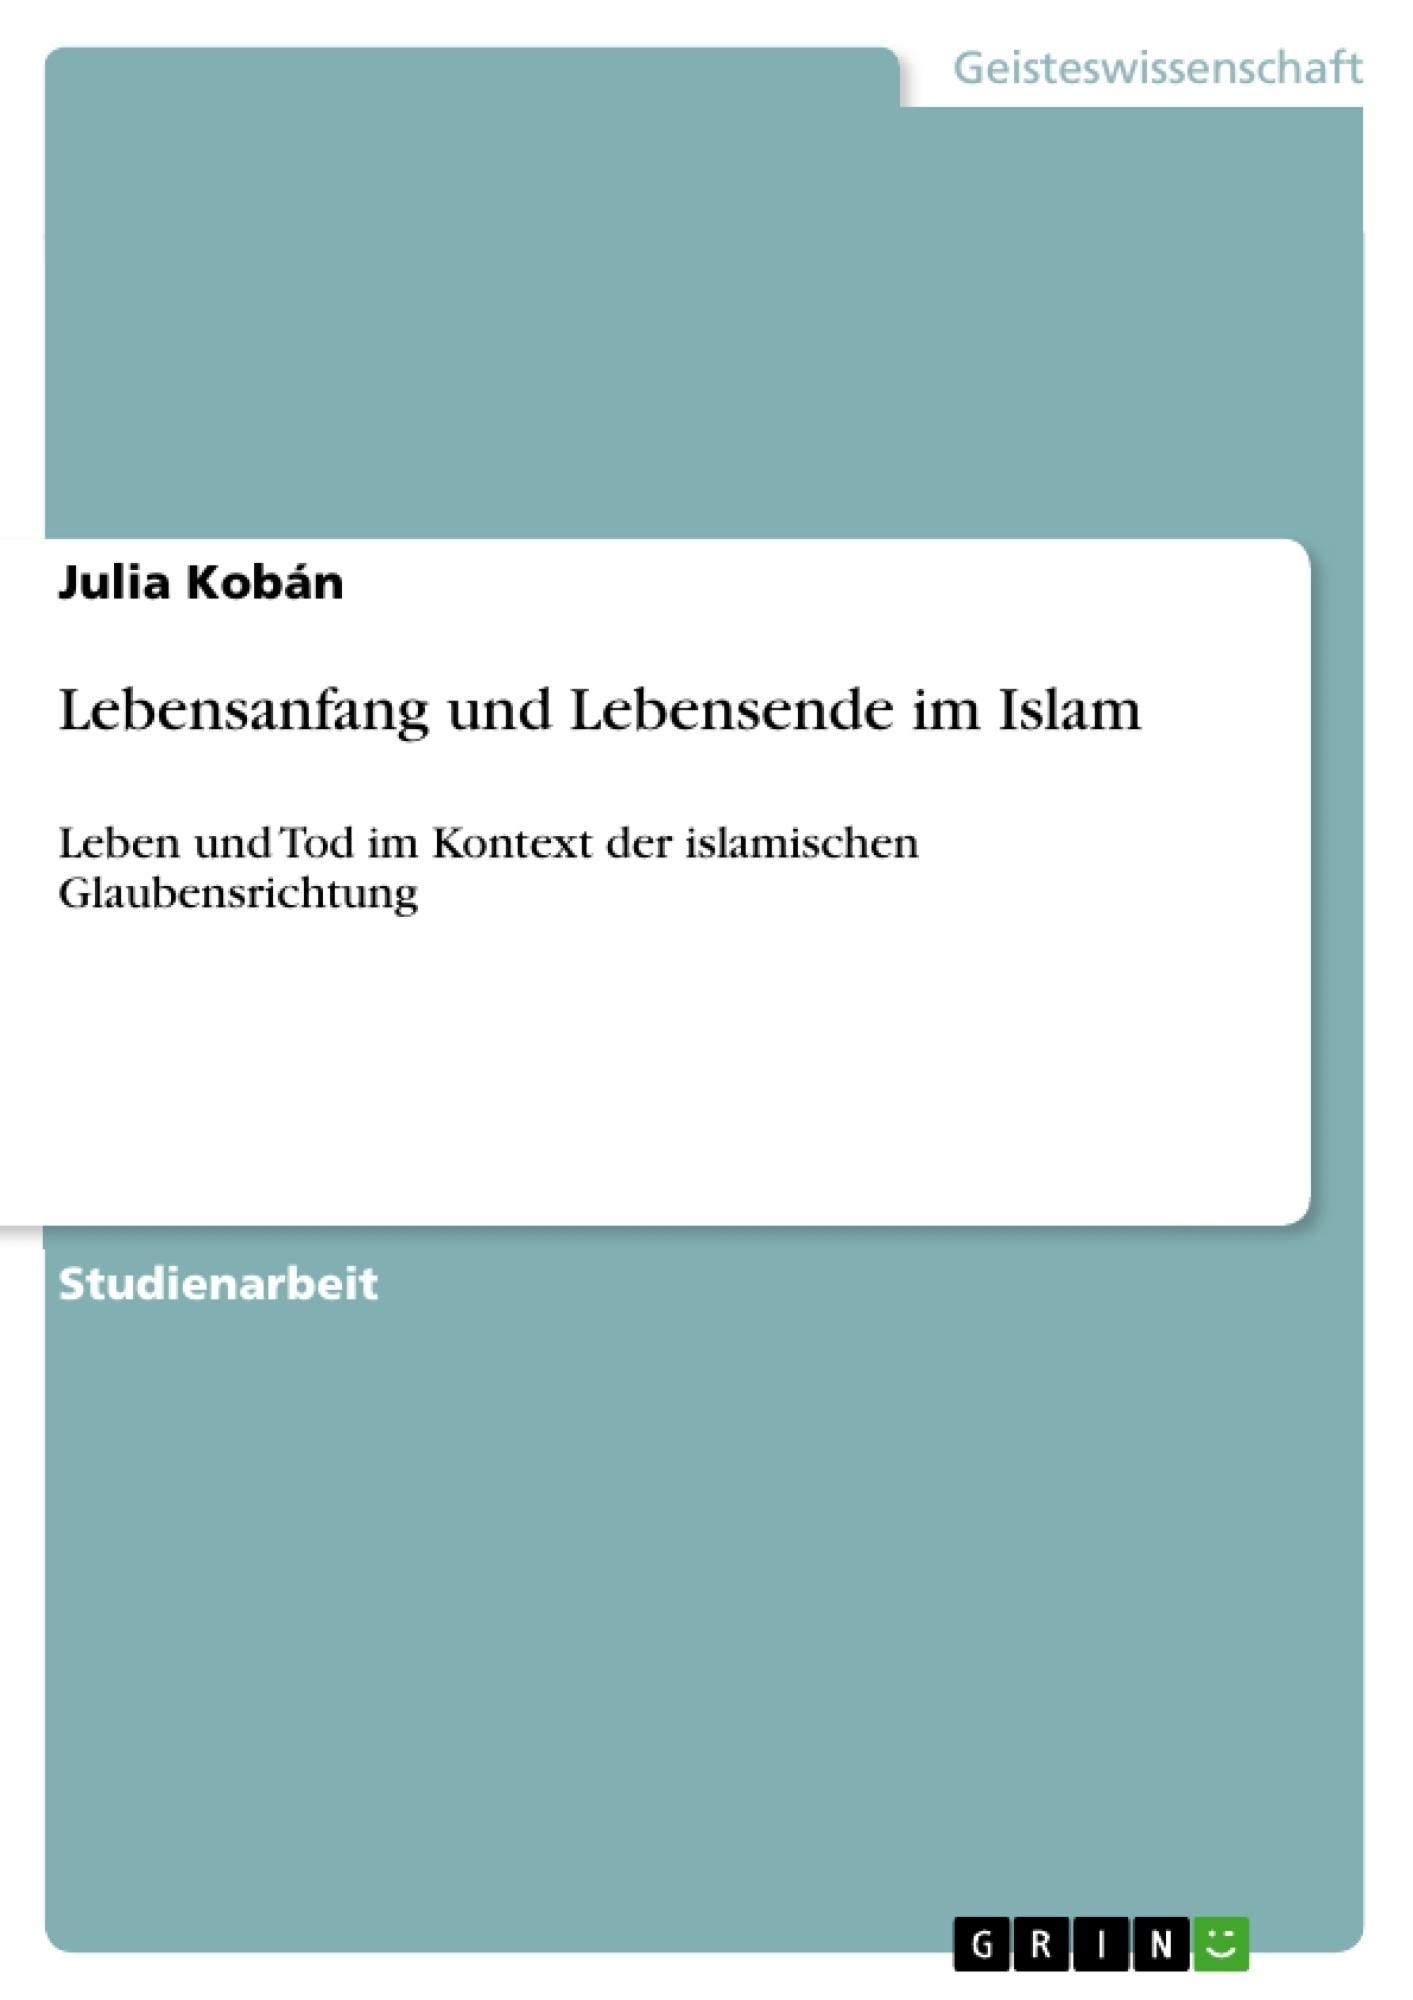 Titel: Lebensanfang und Lebensende im Islam